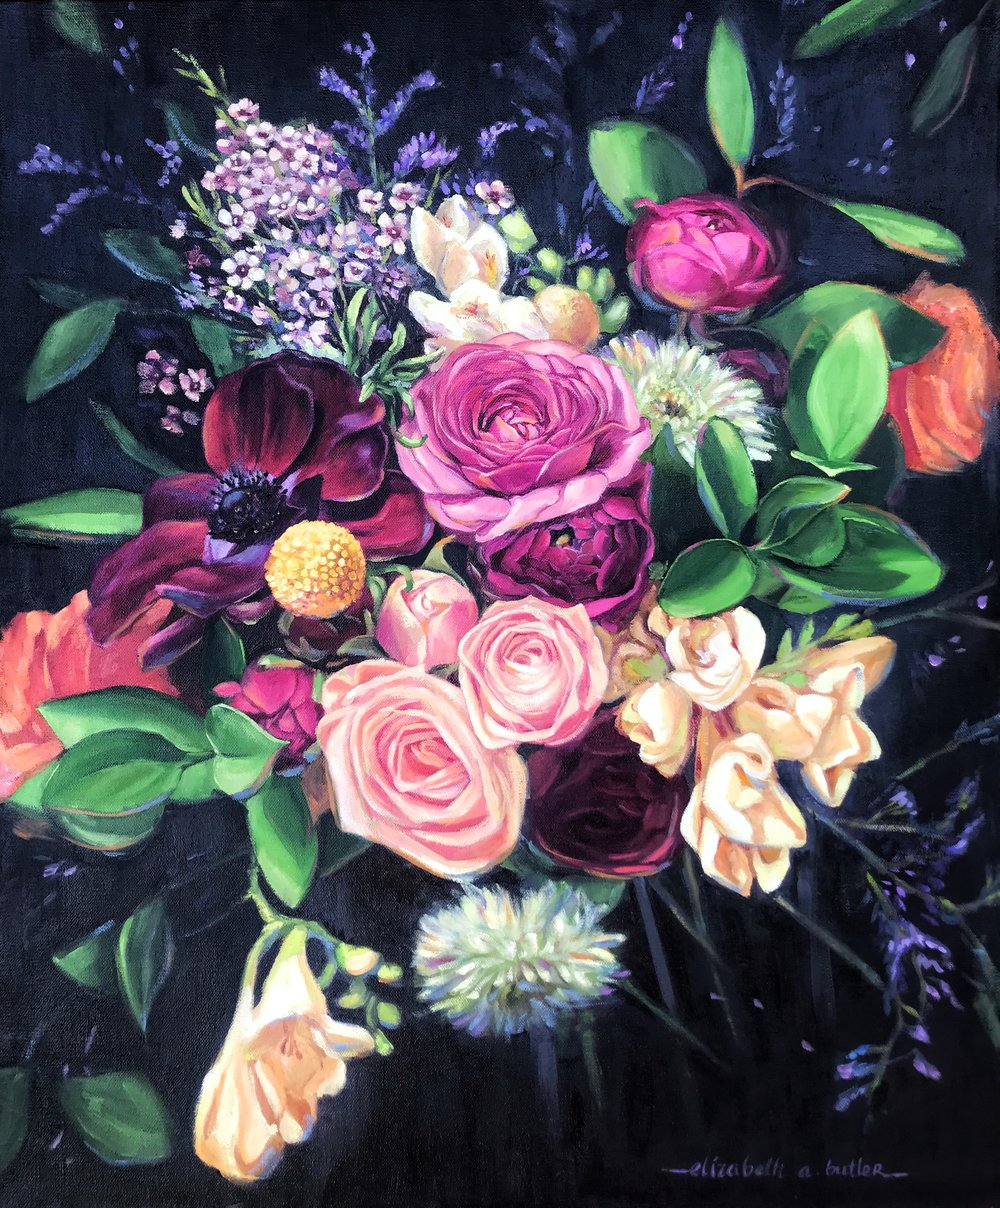 Bright Floral Bouquet on a Dark Background